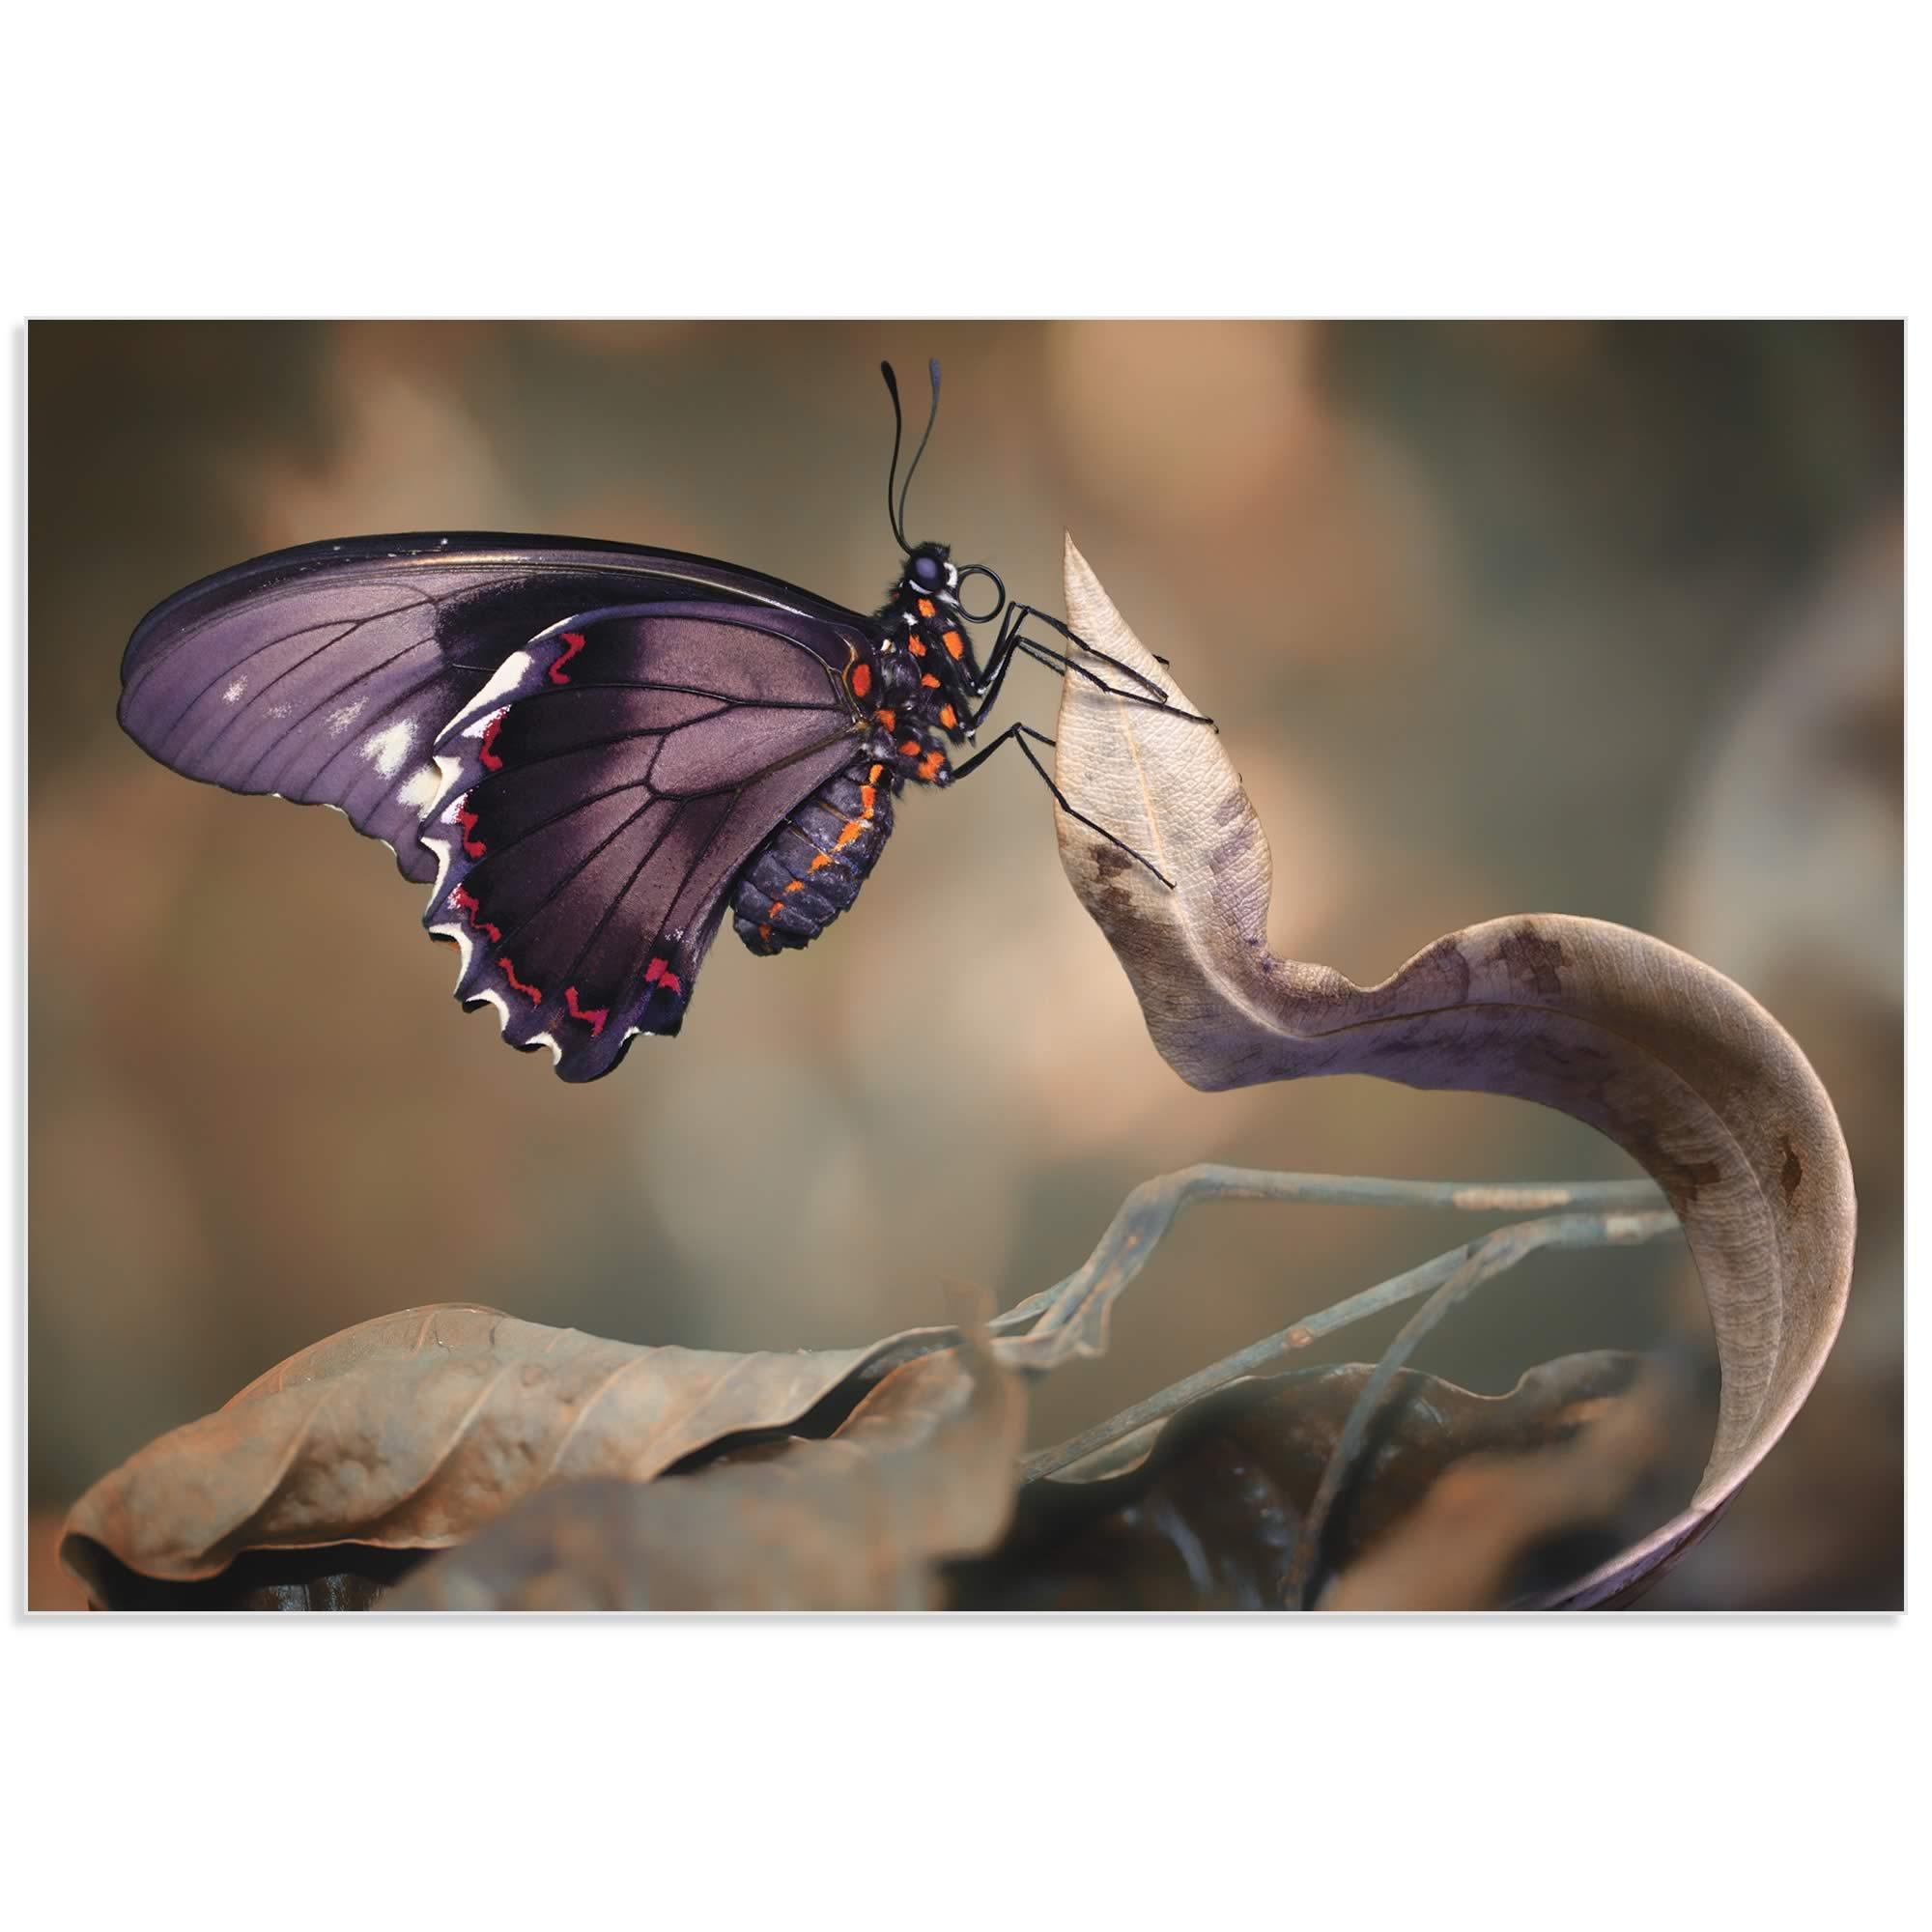 Swallowtail Butterfly by Jimmy Hoffman - Butterfly Wall Art on Metal or Acrylic - Alternate View 2